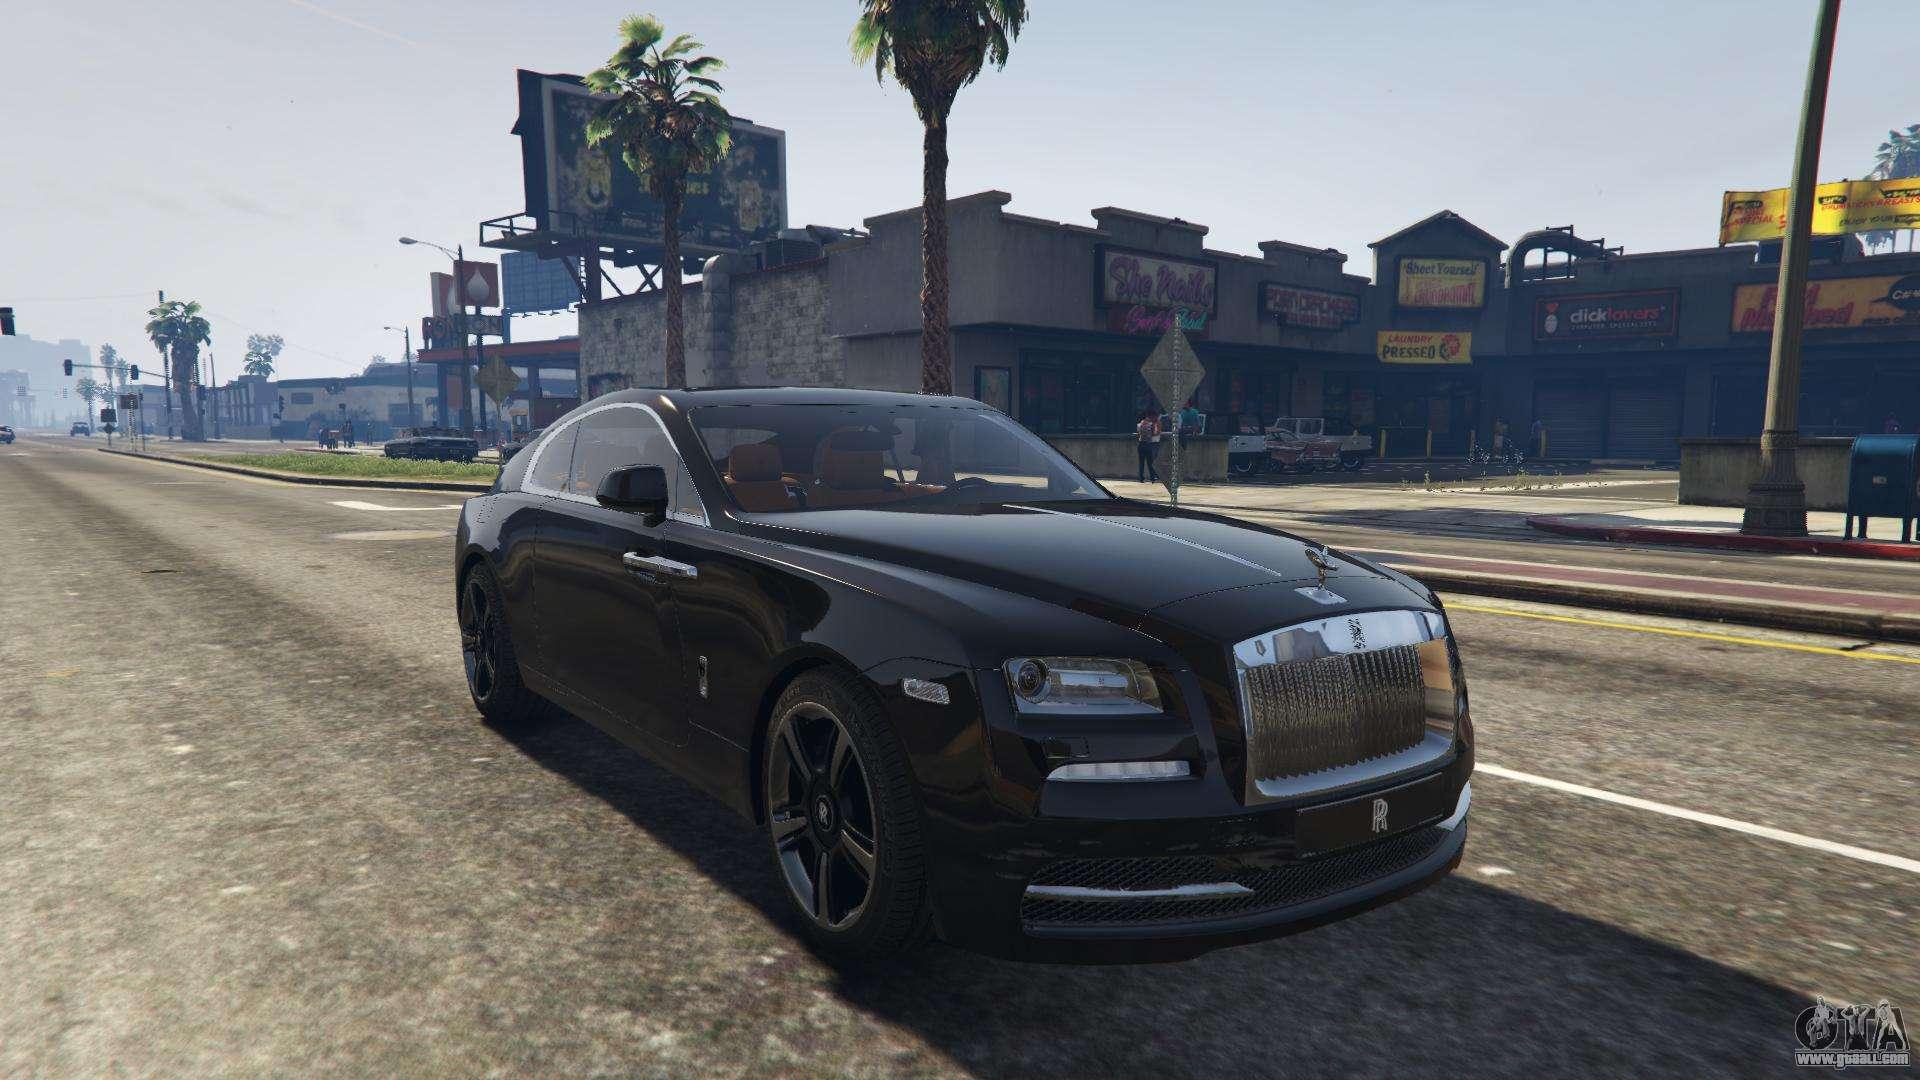 rolls royce wraith car 2015. gta 5 rollsroyce wraith 2015 back view rolls royce car